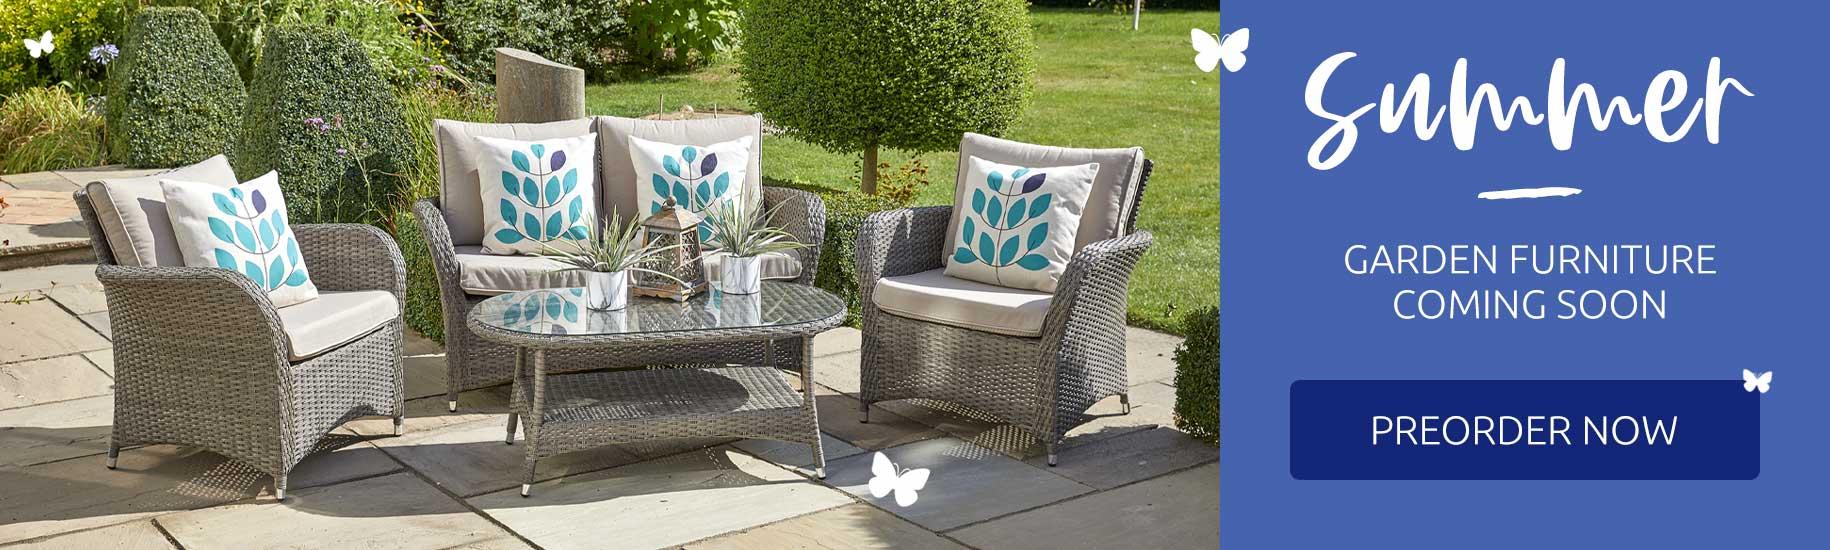 Summer garden furniture coming soon - preorder now